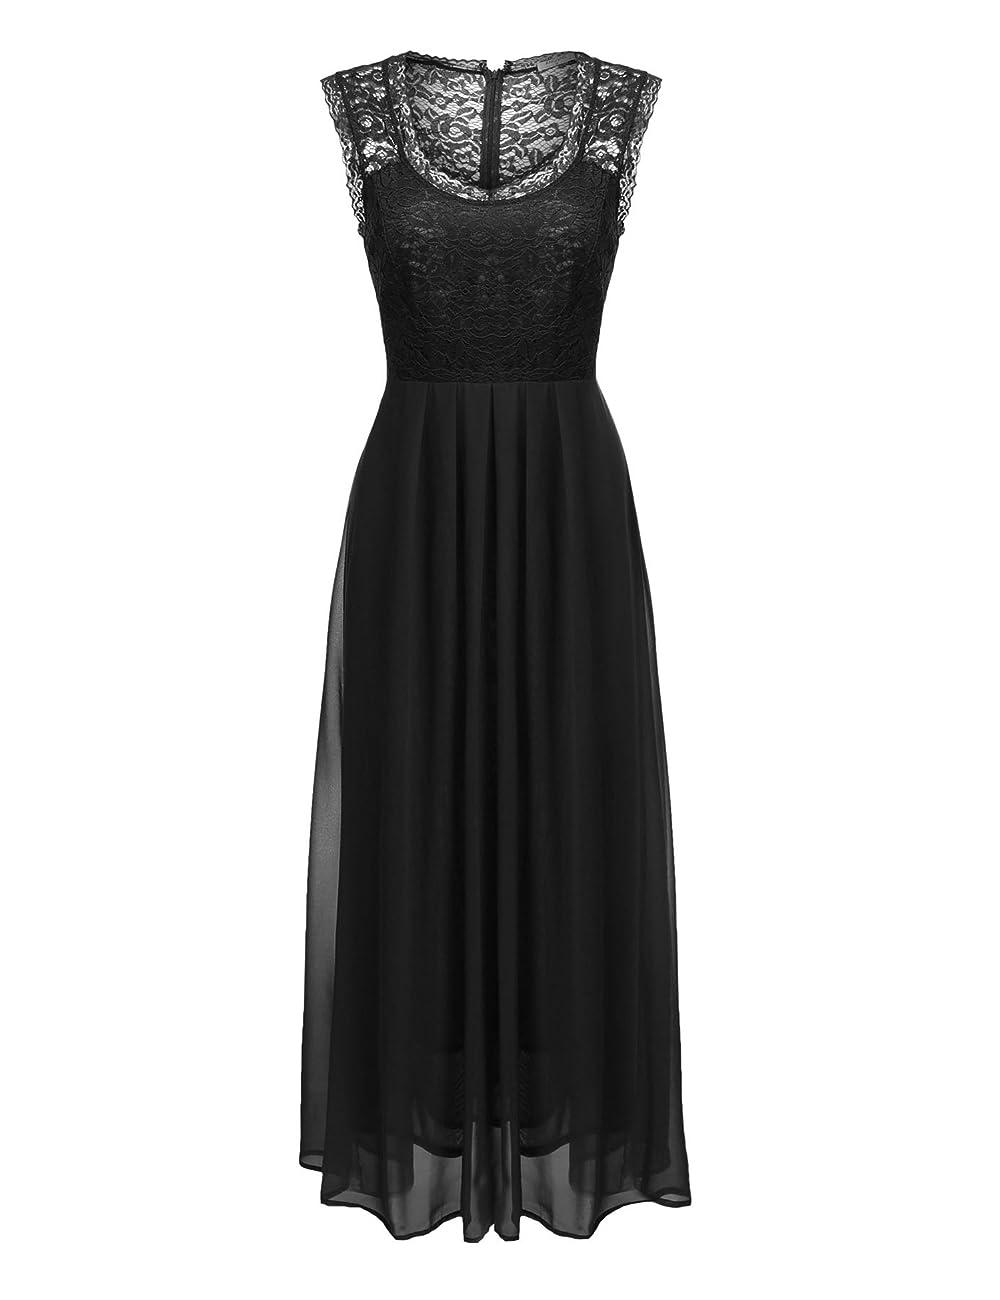 ANGVNS Women's Casual Deep- V Neck Sleeveless Vintage Maxi Dress 3